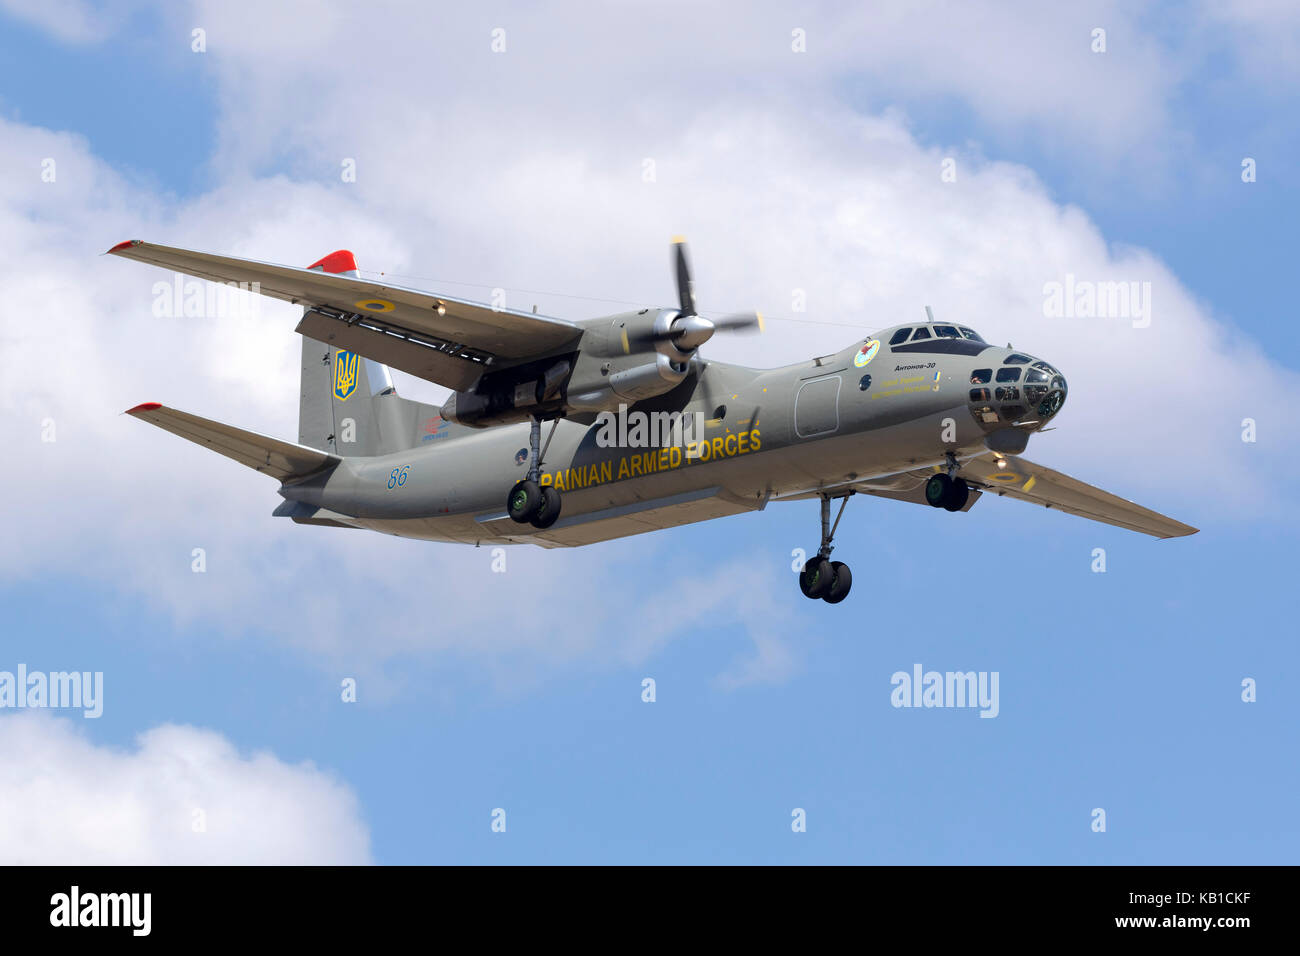 Ukraine Armed Forces Antonov An-30 [REG: 86 blue] on short finals runway 13. - Stock Image